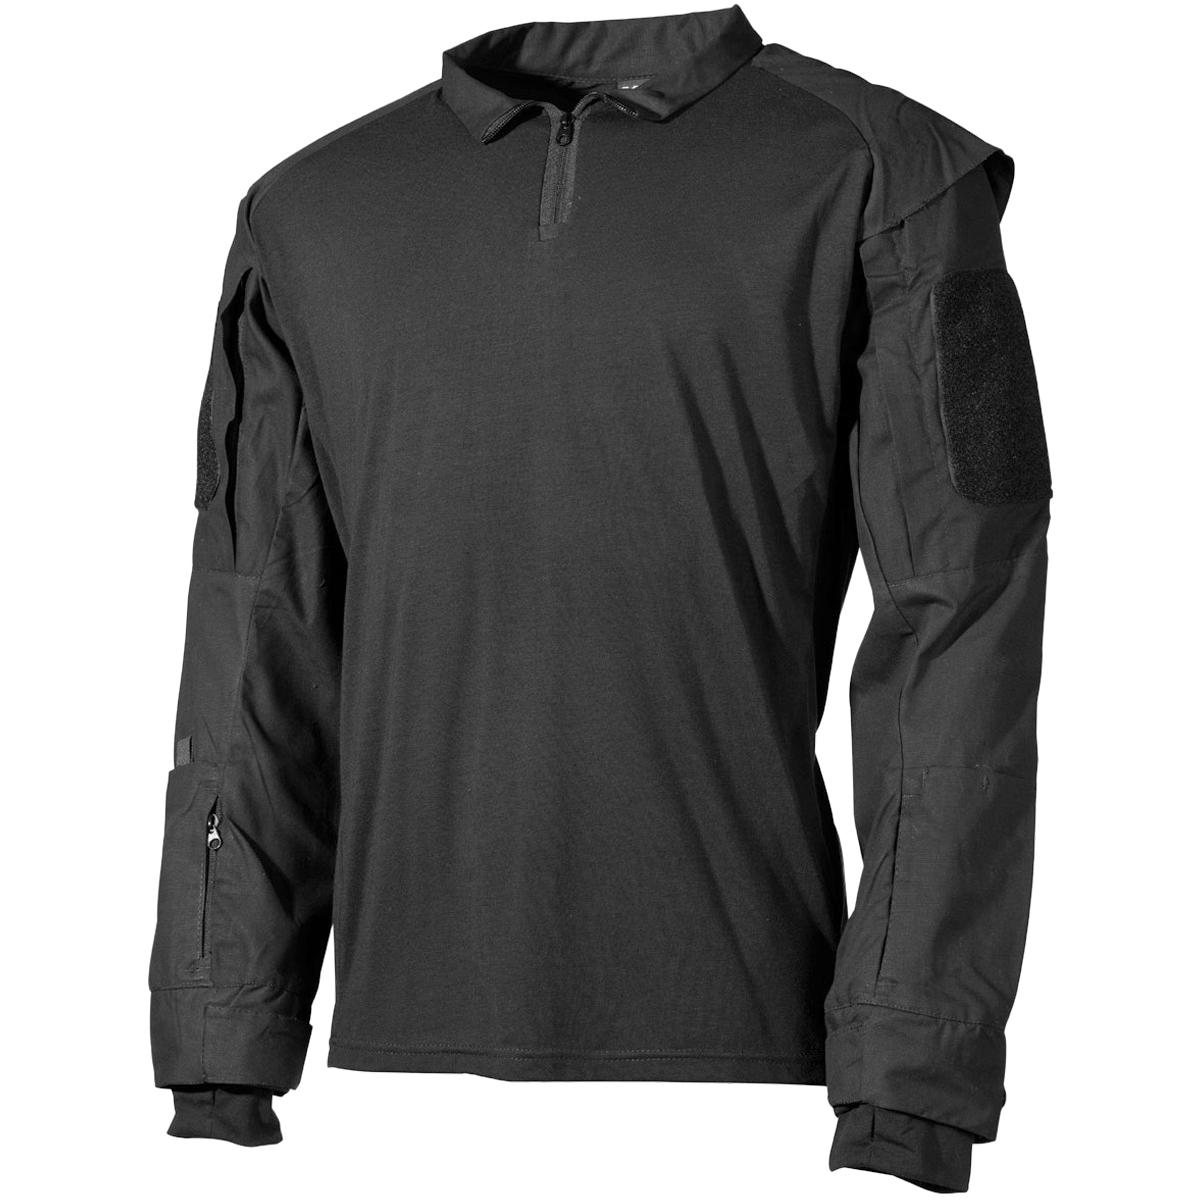 Details about MFH US Tactical Shirt Mens Combat Police Security Jacket  Ripstop Uniform Black 5b370b1d7a6